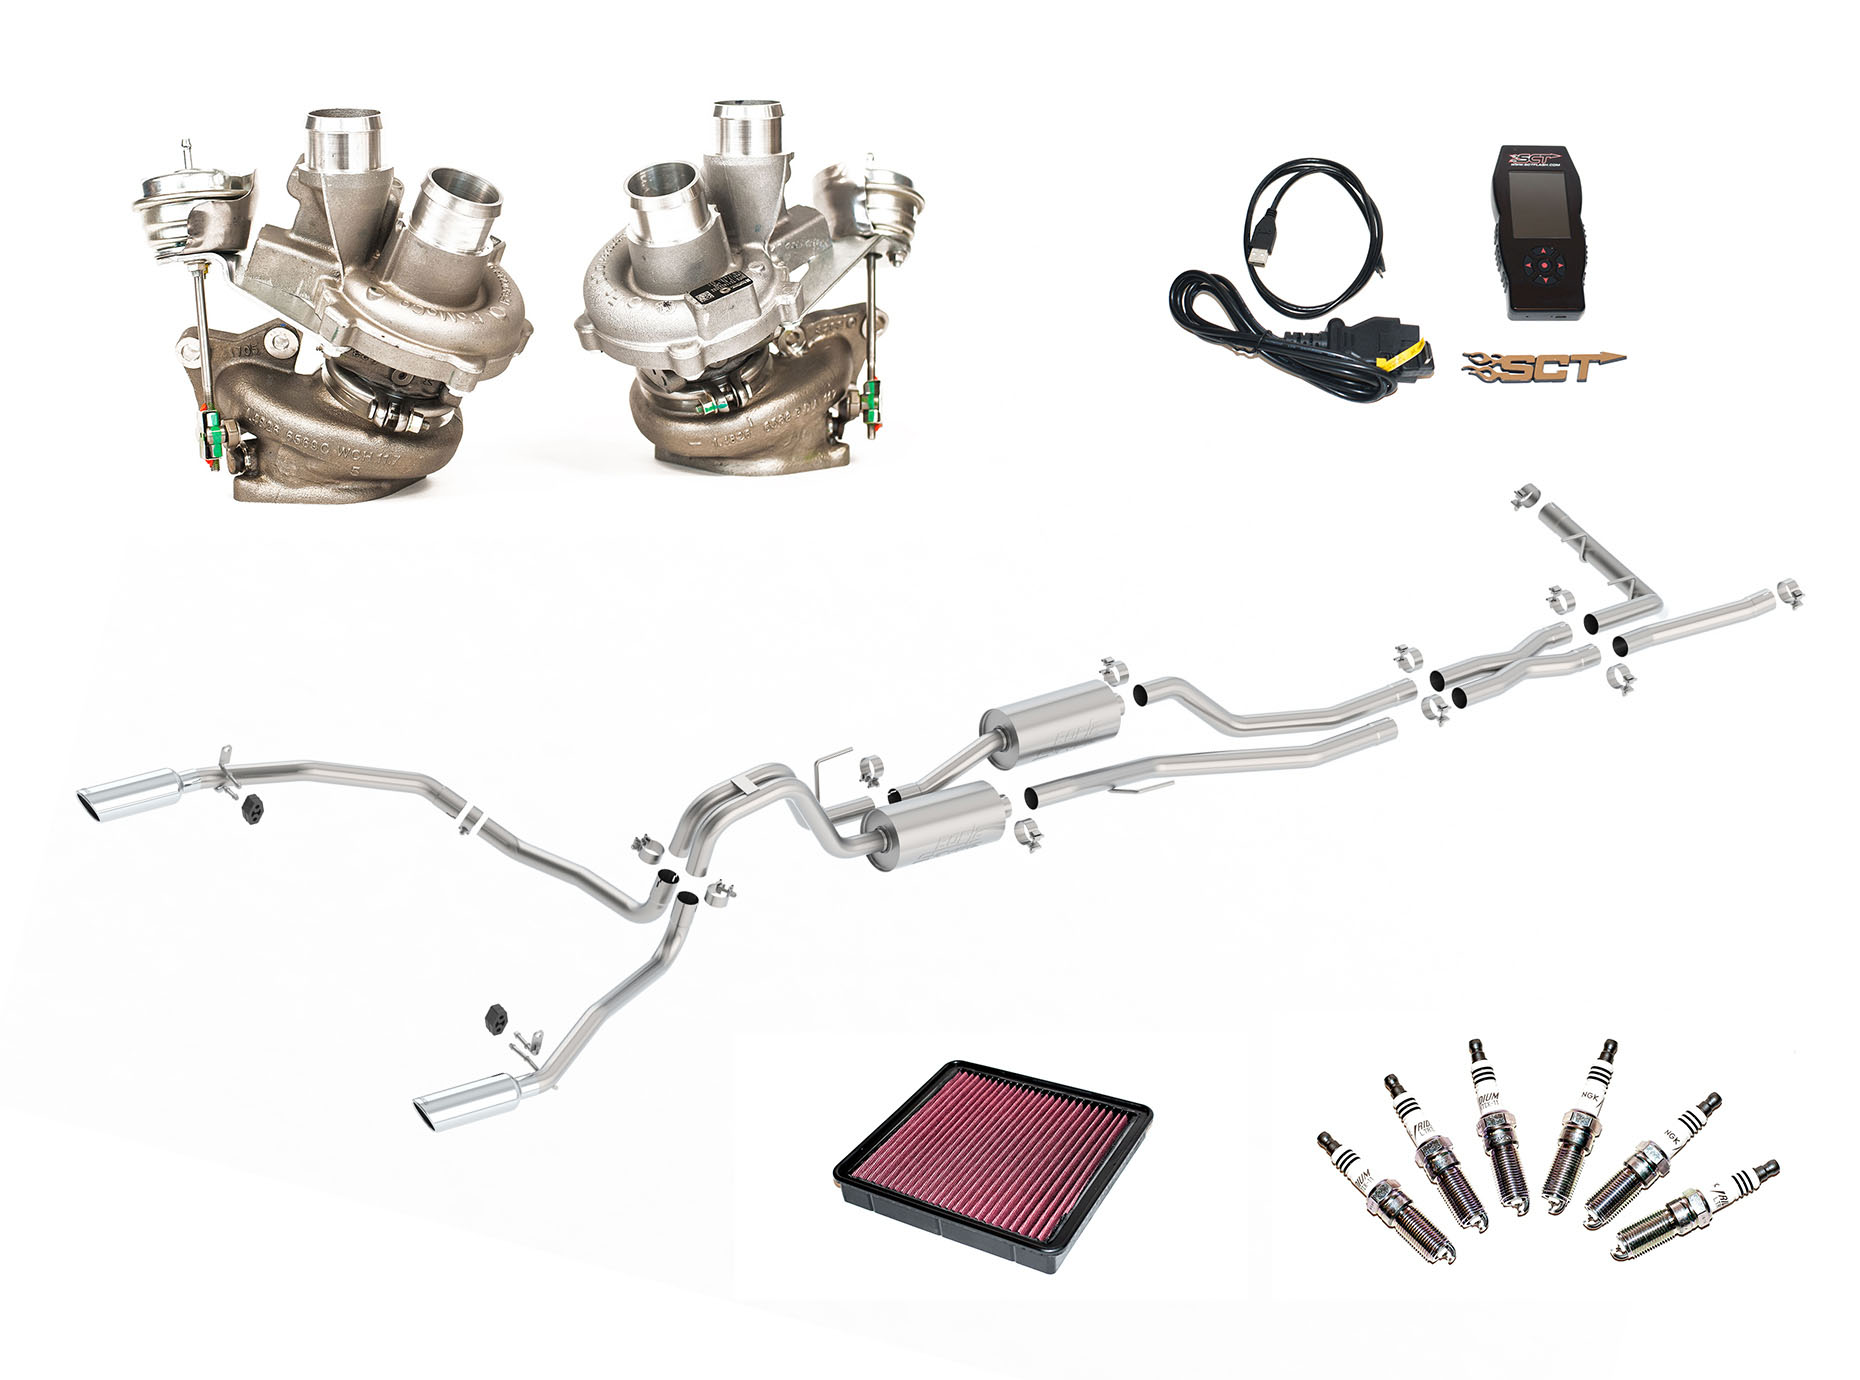 2017 2016 Ford F150 3 5l Eb Borla Turbocharger Upgrade Kits 251006